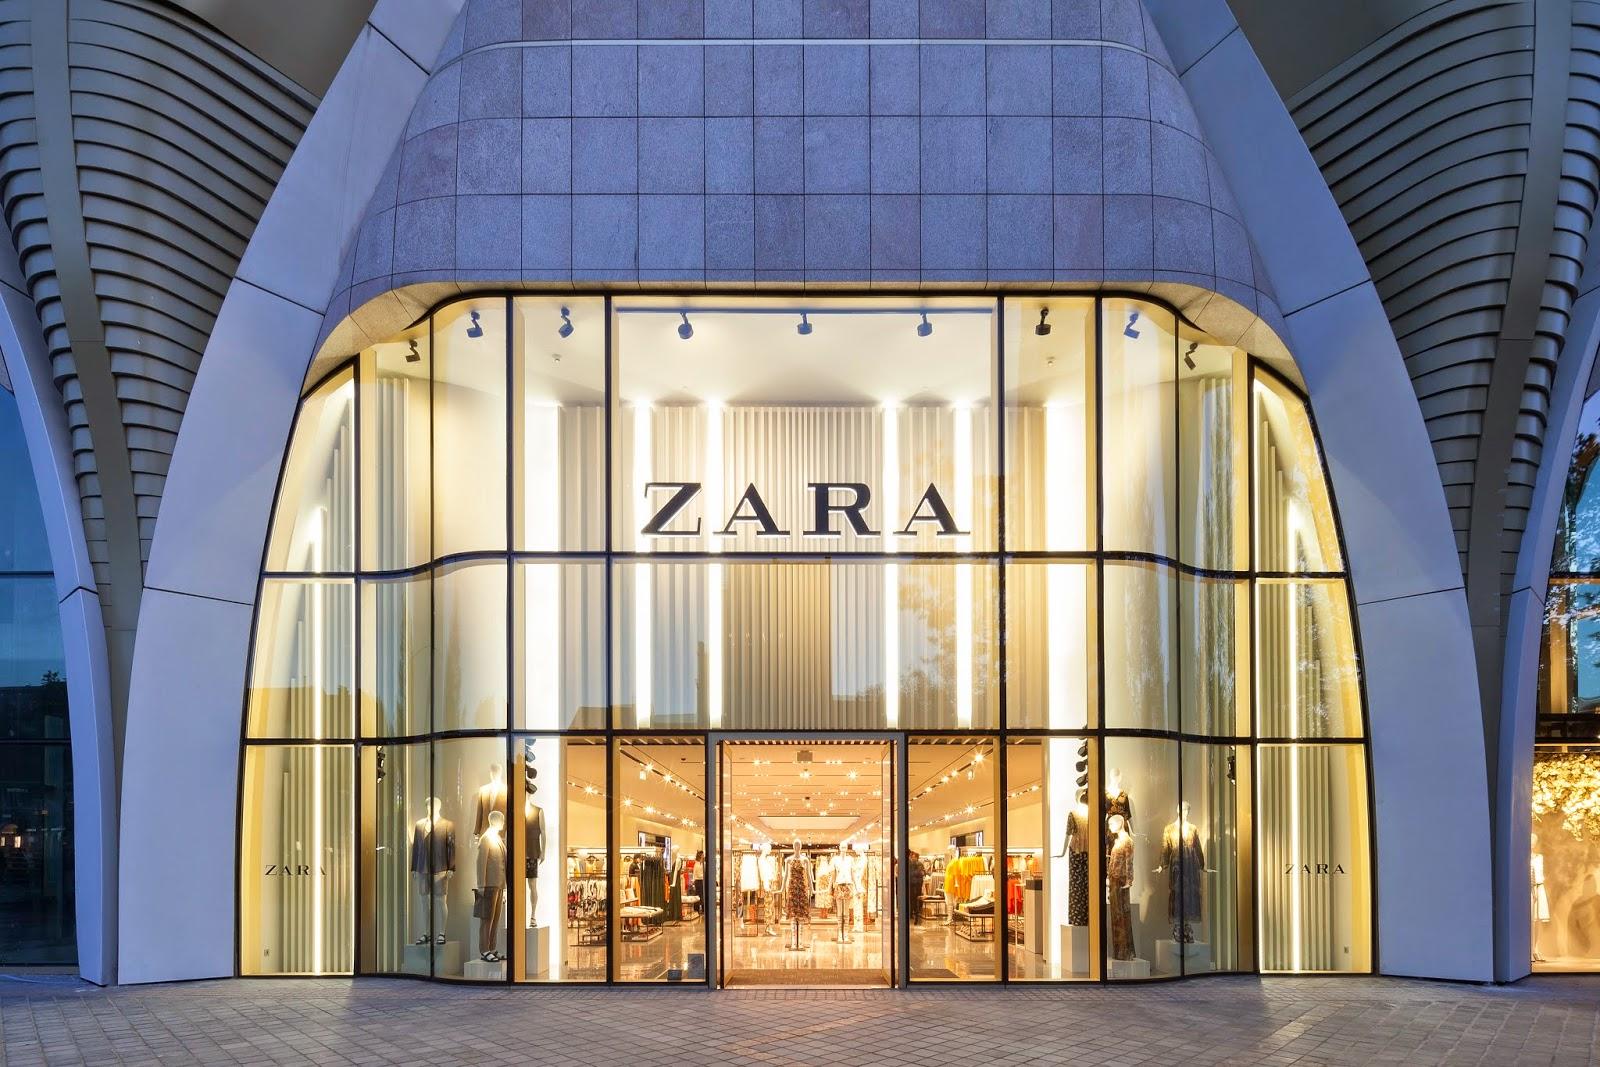 Zara Decoration Bruxelles : Zara taking over bxl à cause des brunettes